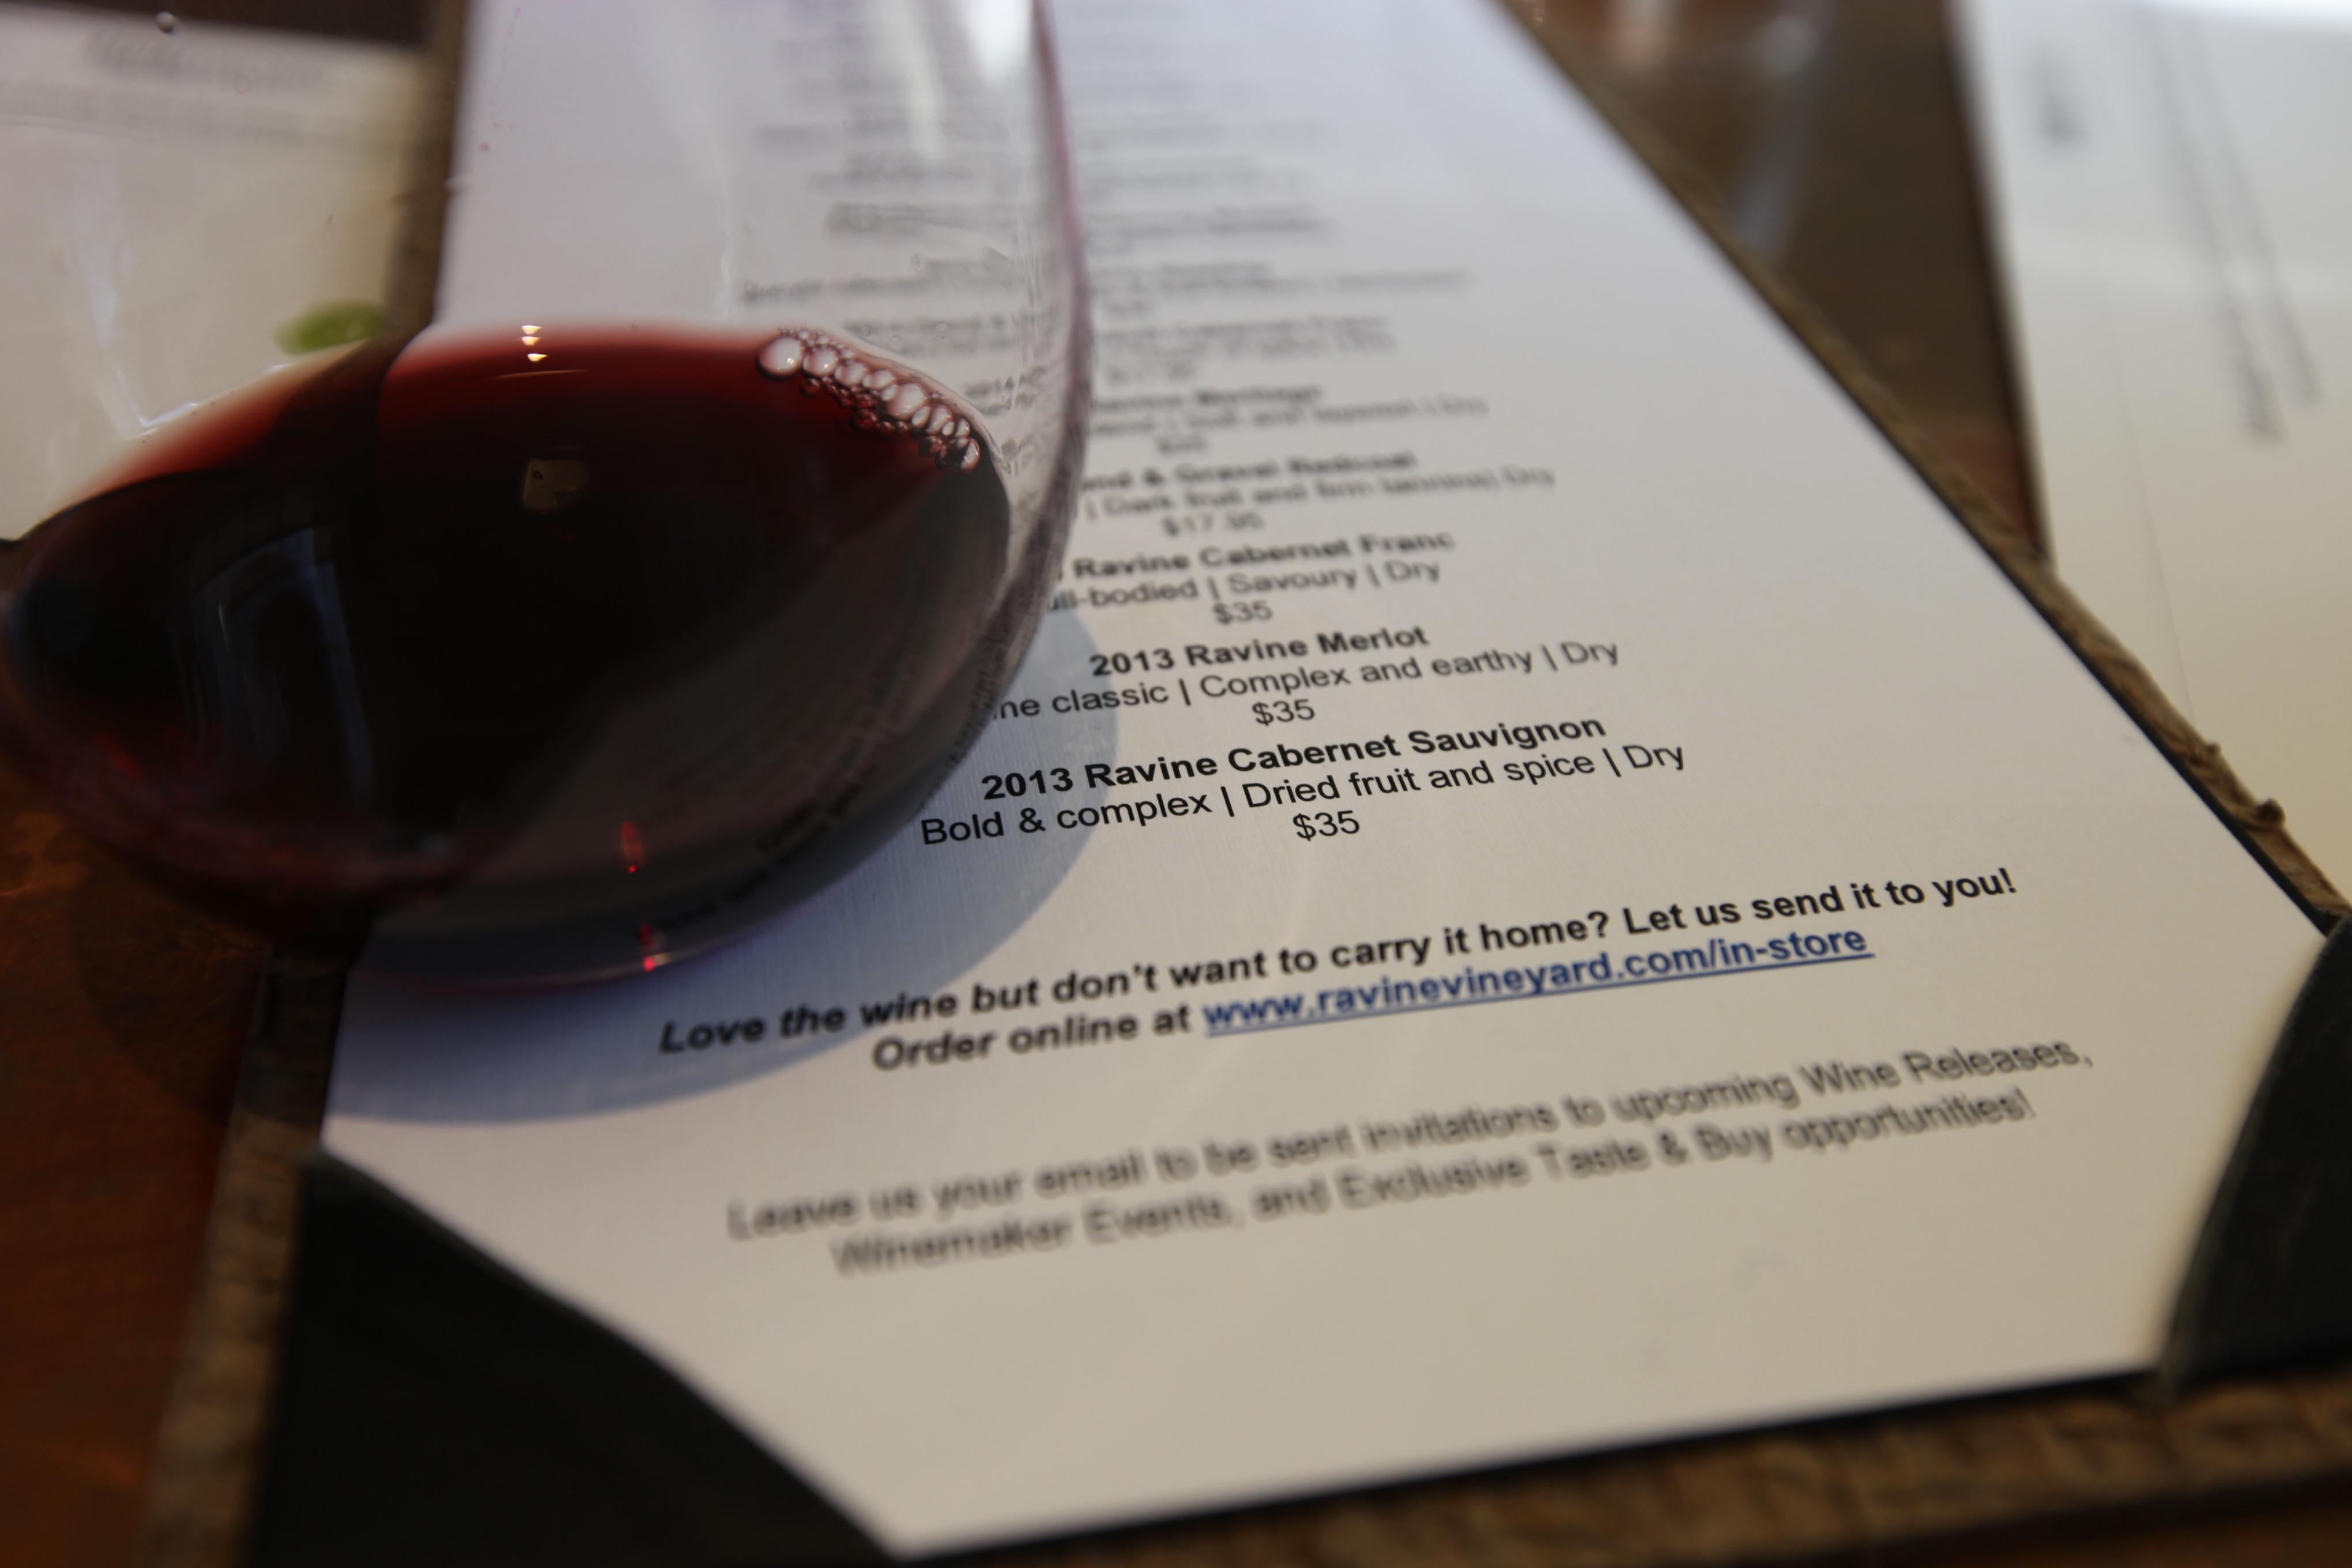 Ravine Wineyard LXRY Magazine 2